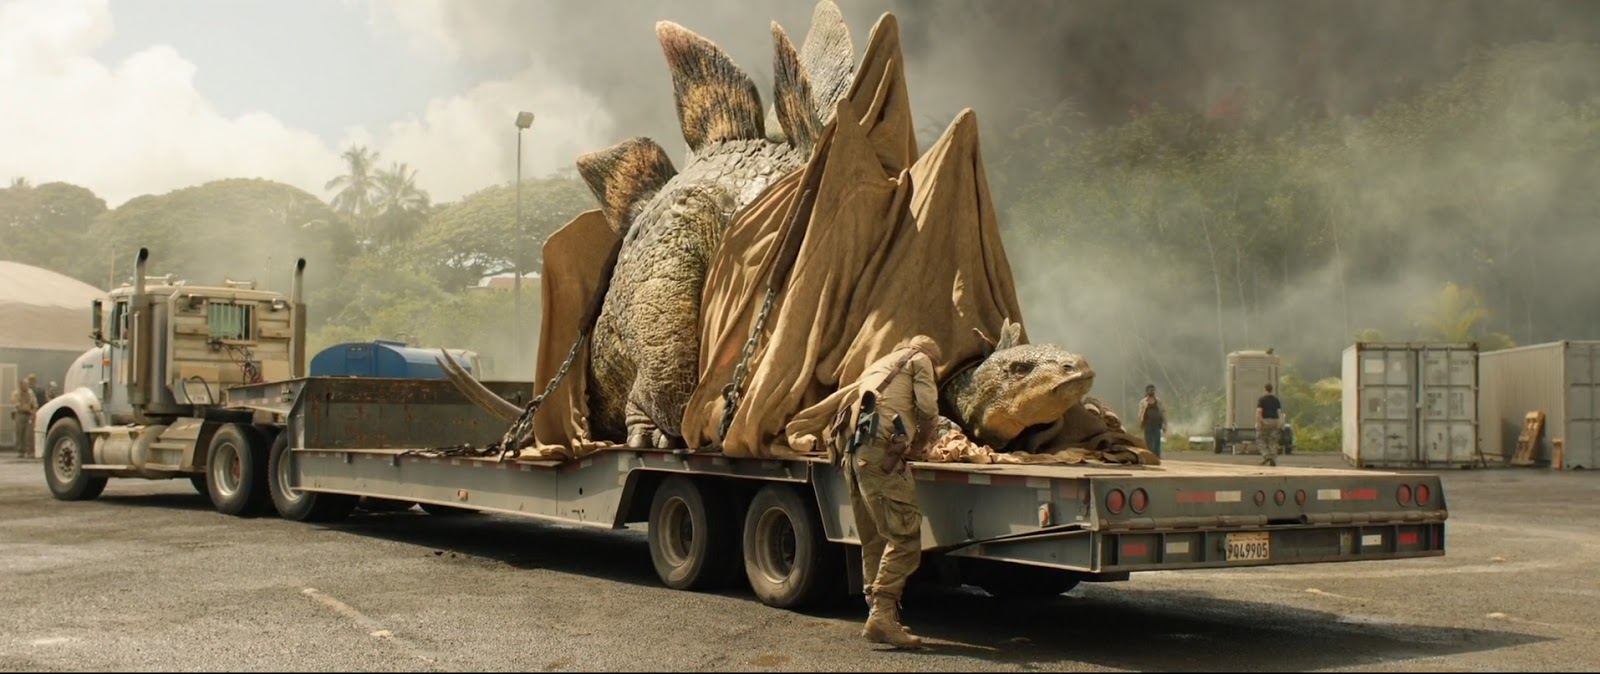 Estreno Jurassic World El Reino Caído 2018 Dual 1080 Ligero